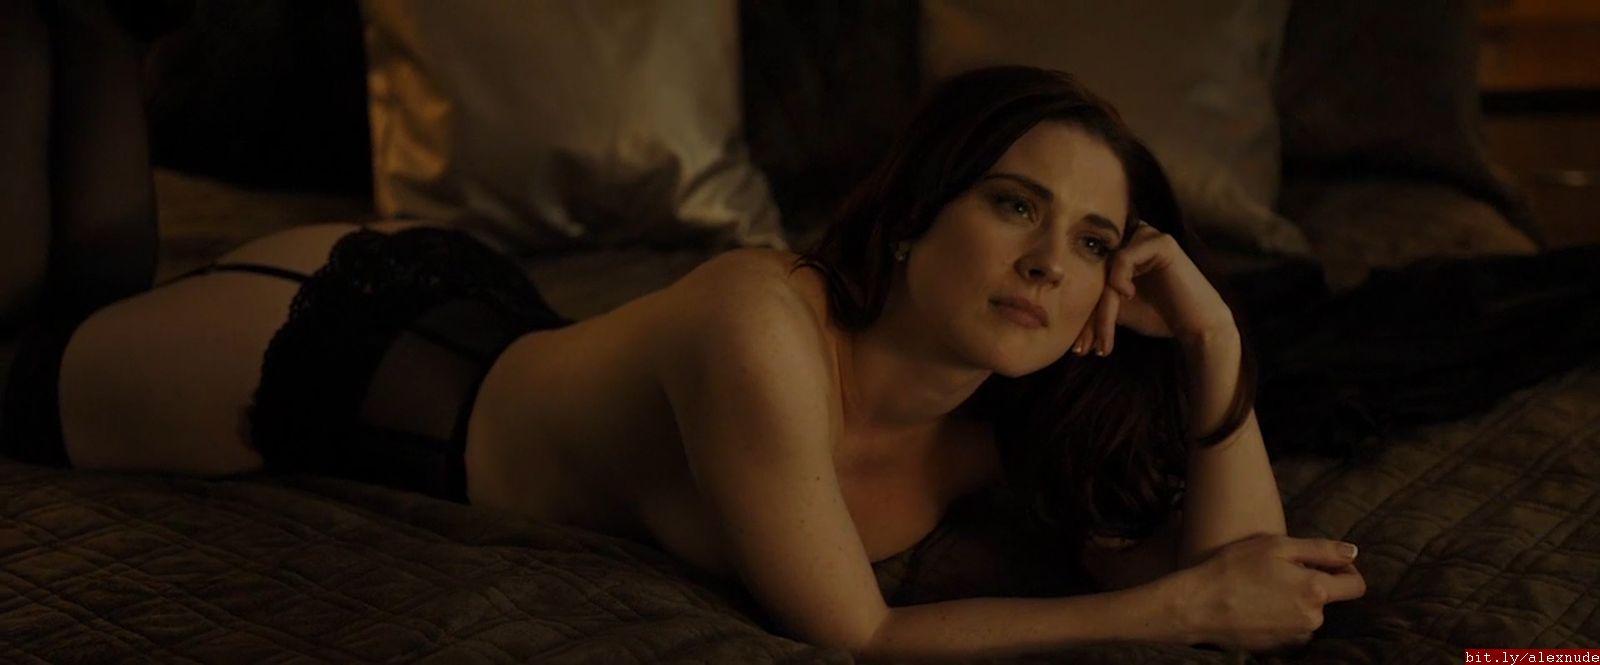 Incredibles porn violet and dash sex